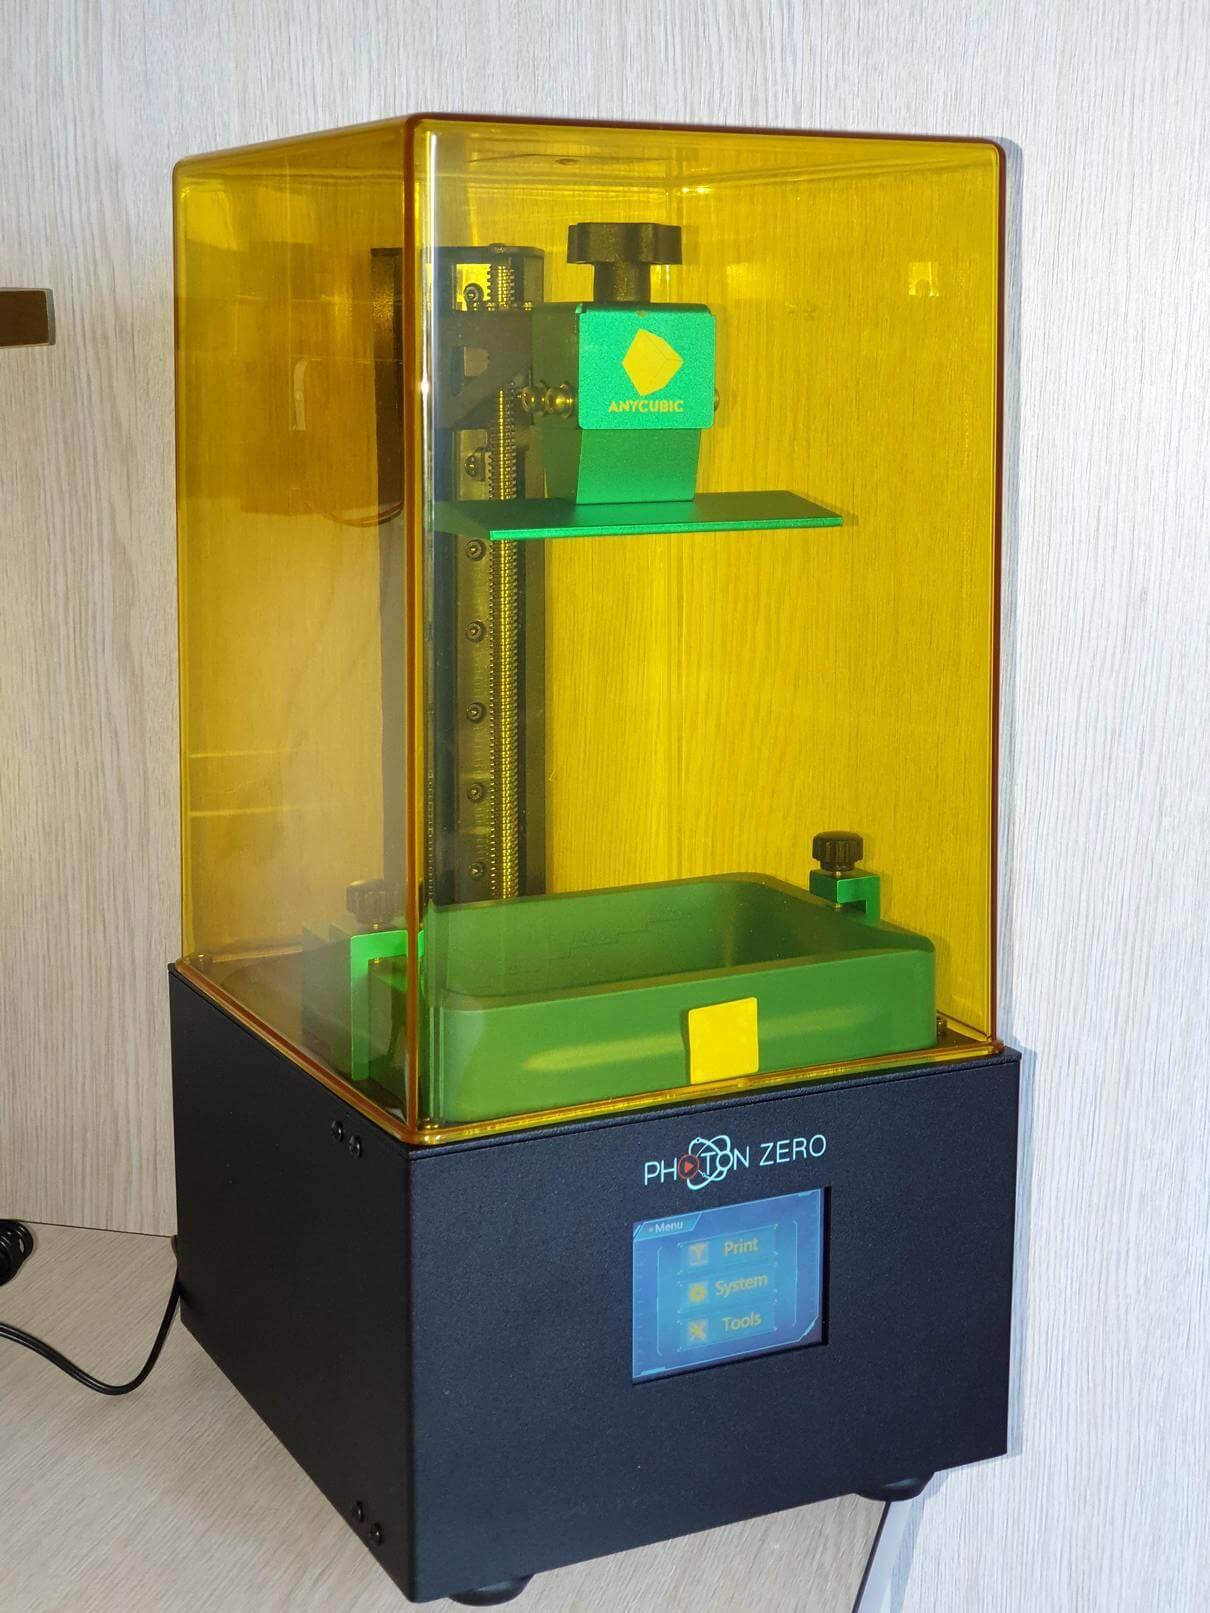 Anycubic Photon Zero Budget Resin Printer 2   Anycubic Photon Zero Review - Budget Resin Printer